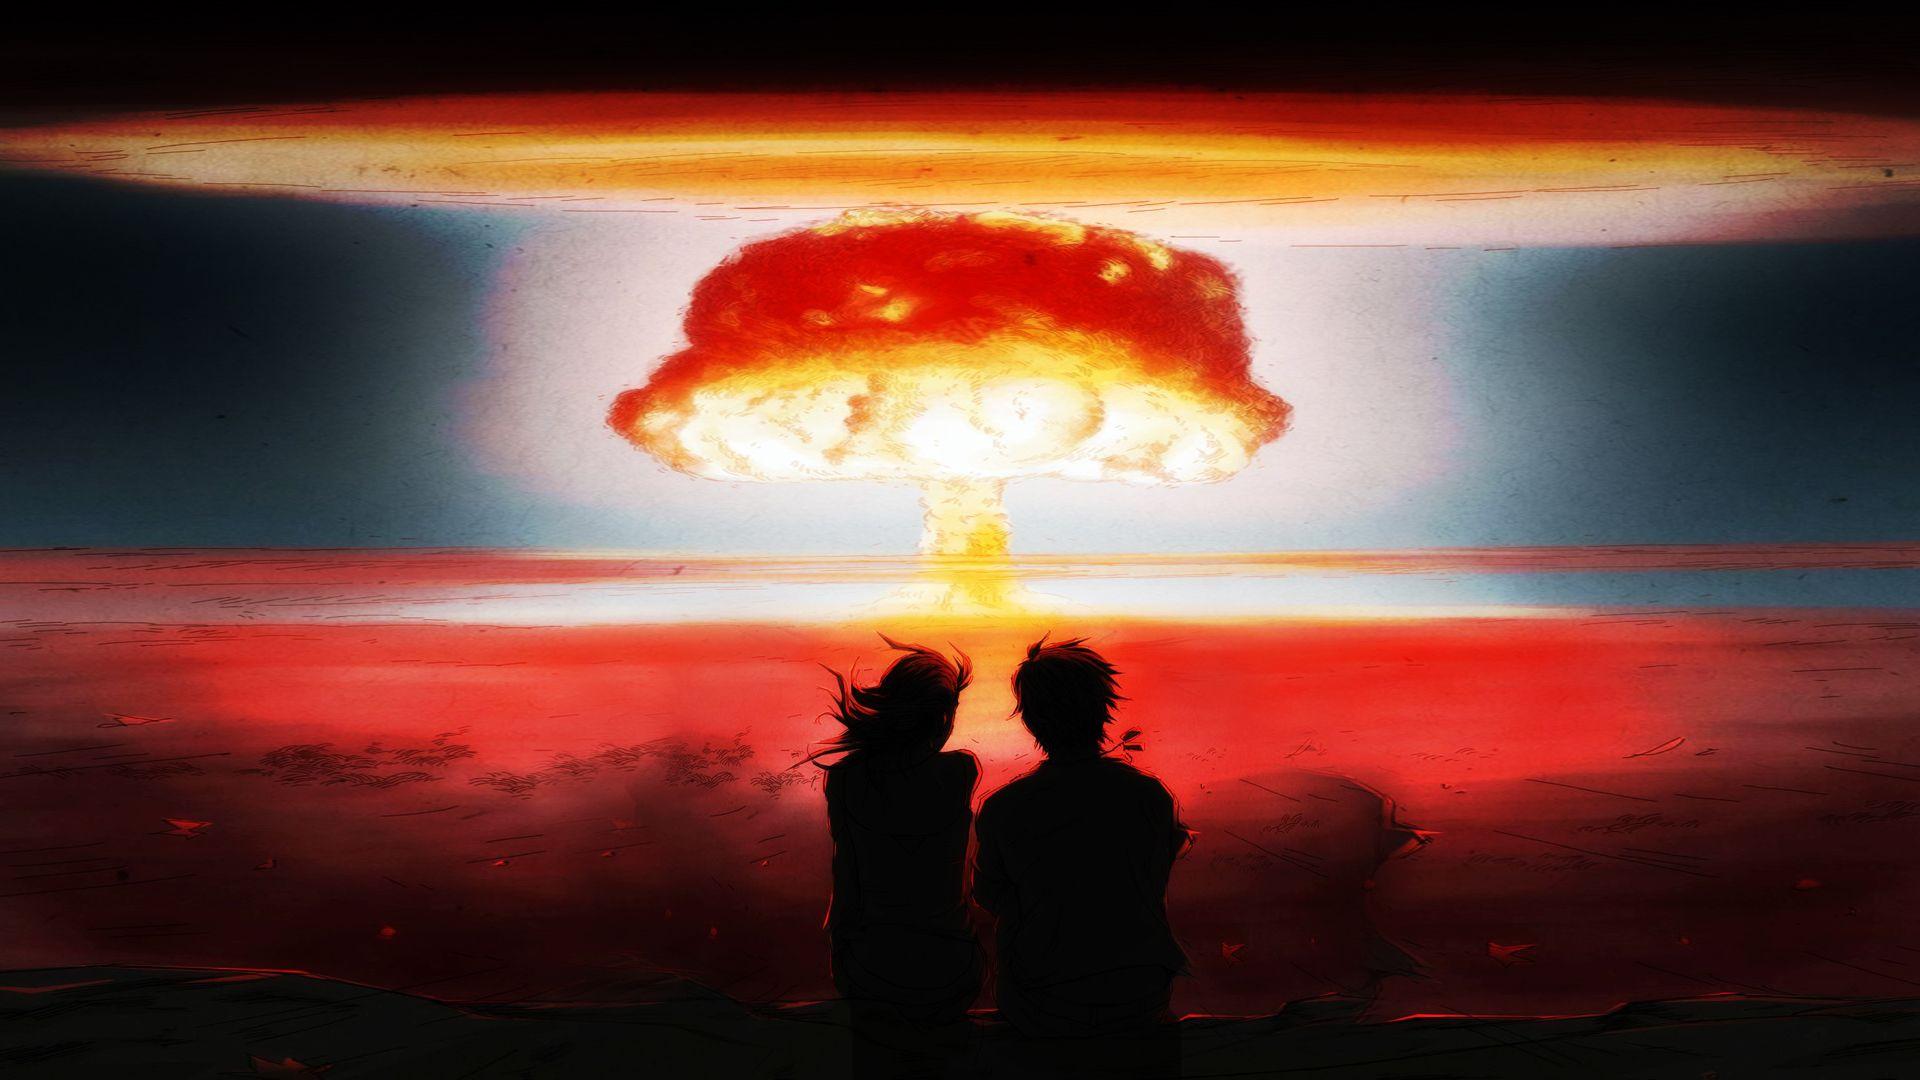 Nuclear Explosion Wallpaper Hd World Wallpaper Love Wallpaper